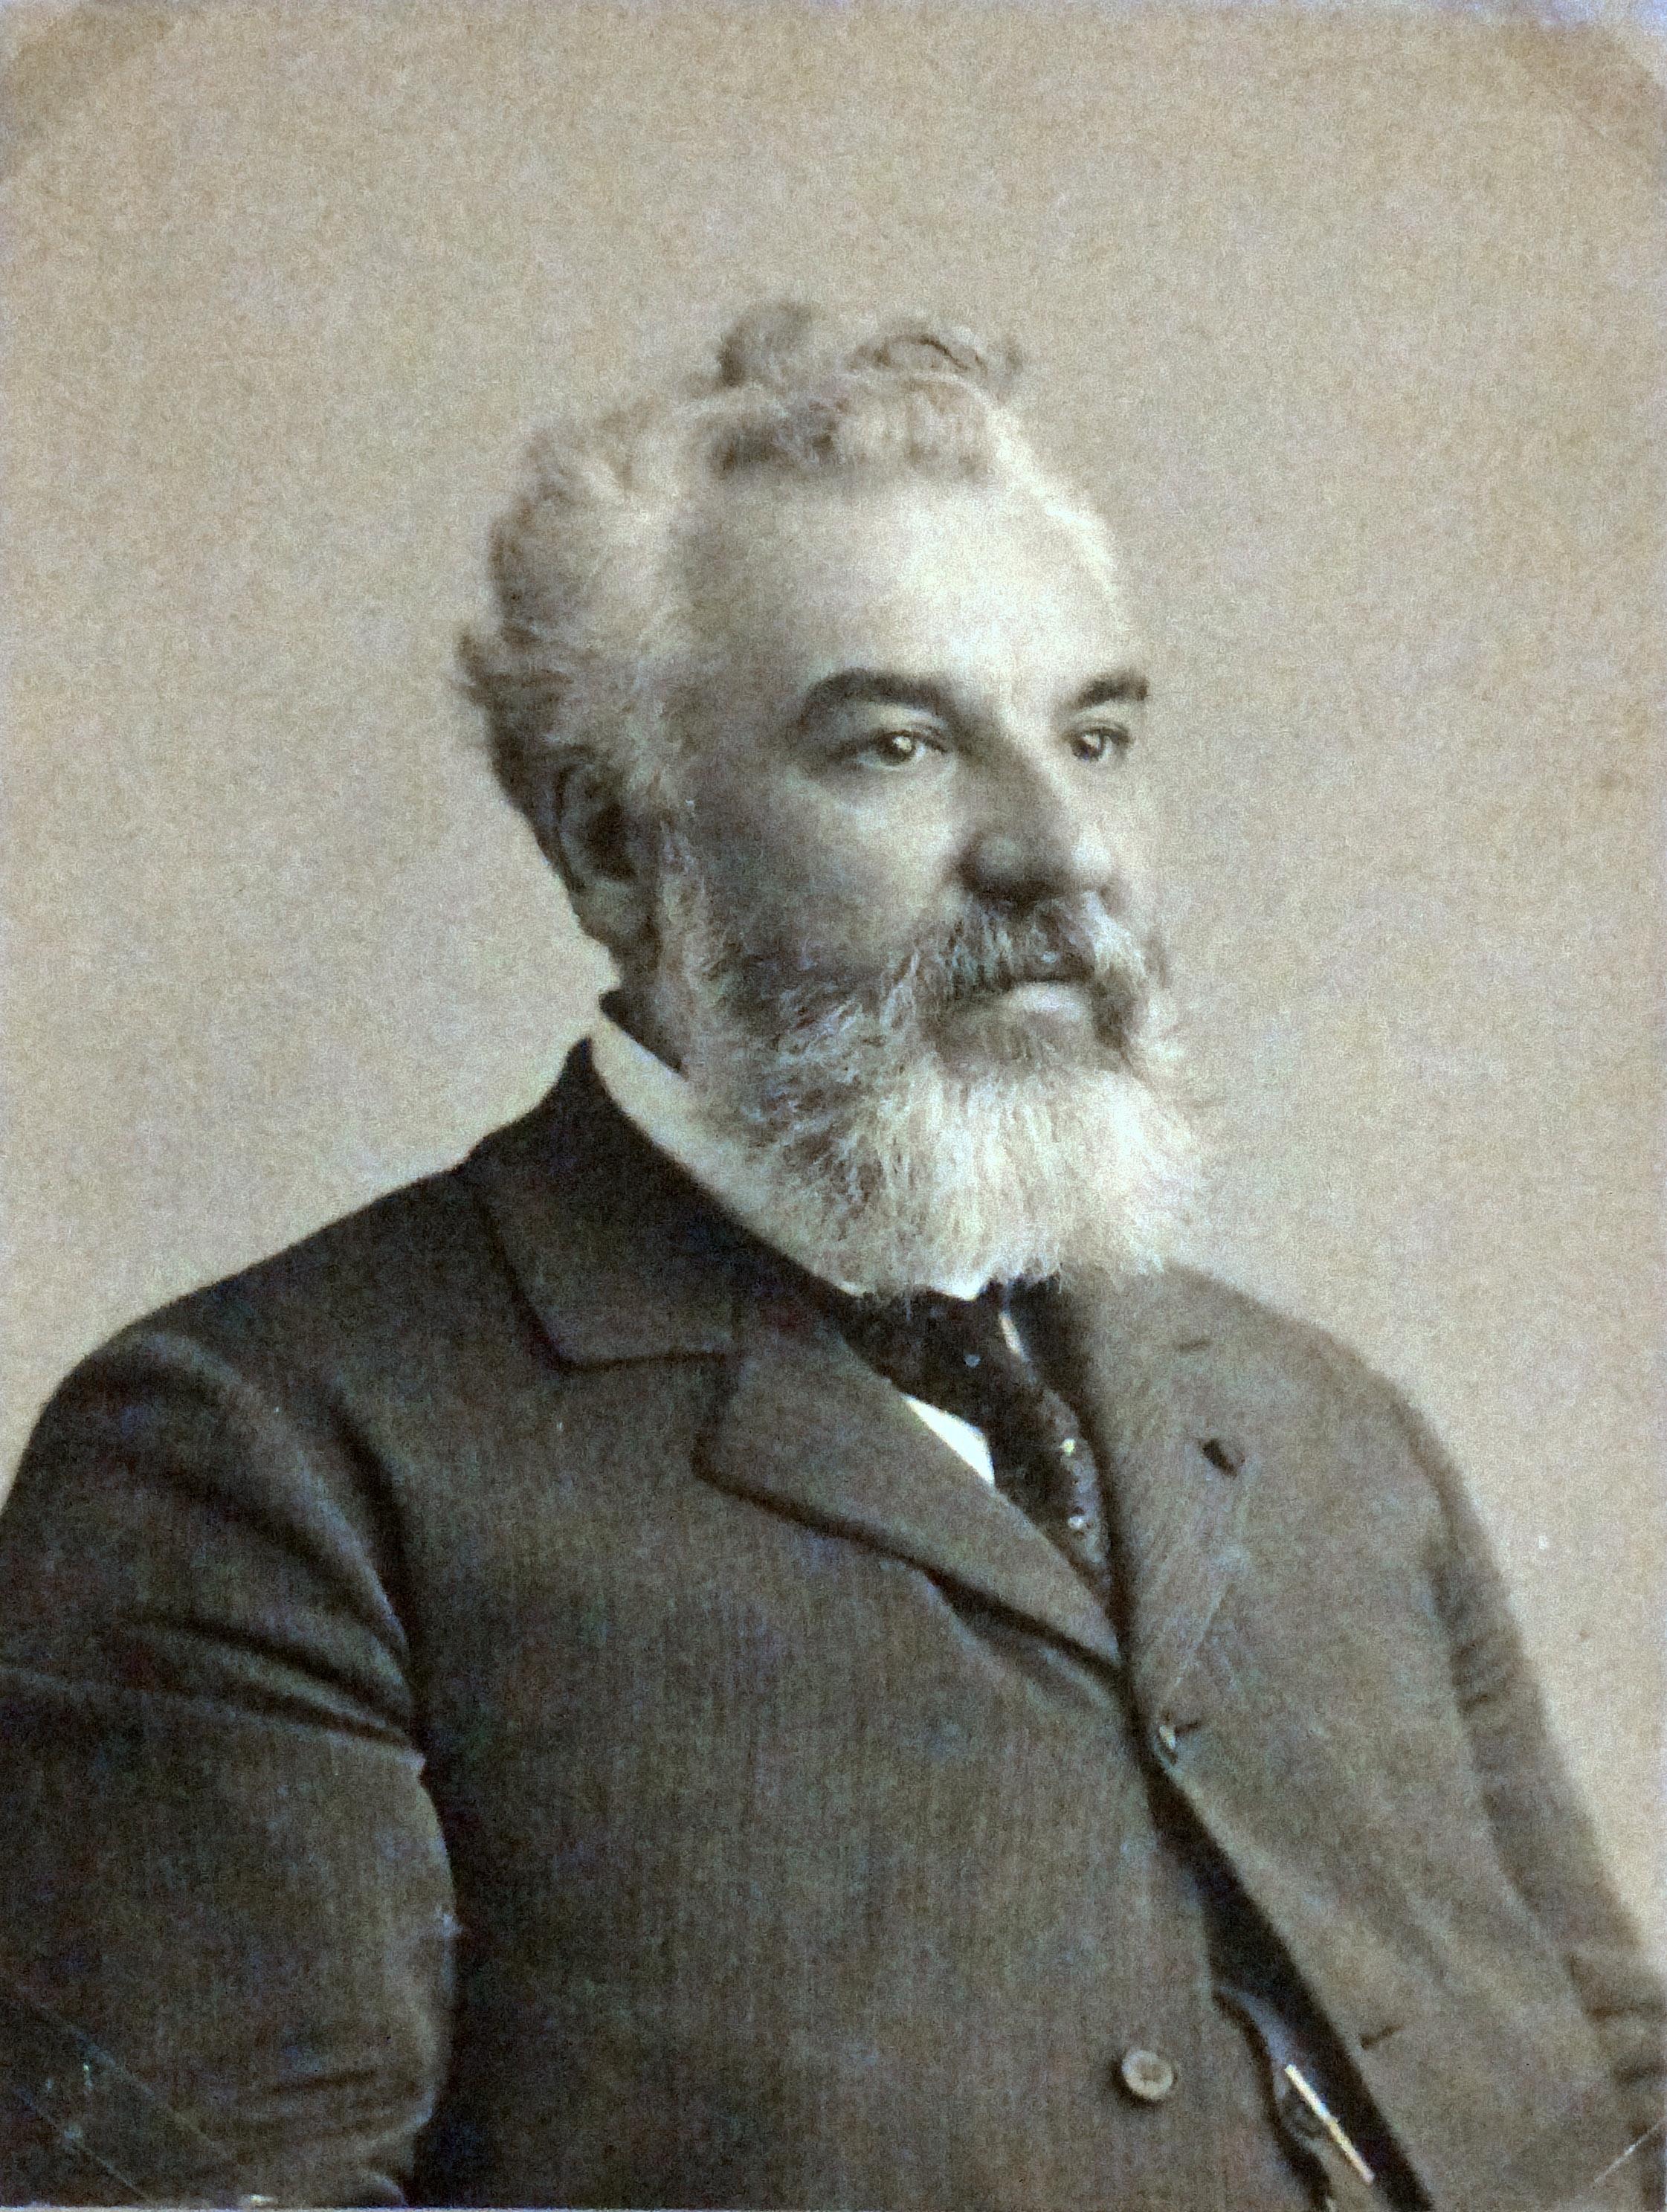 Alexander graham bell images Alexander Graham Bell Biography - Biography